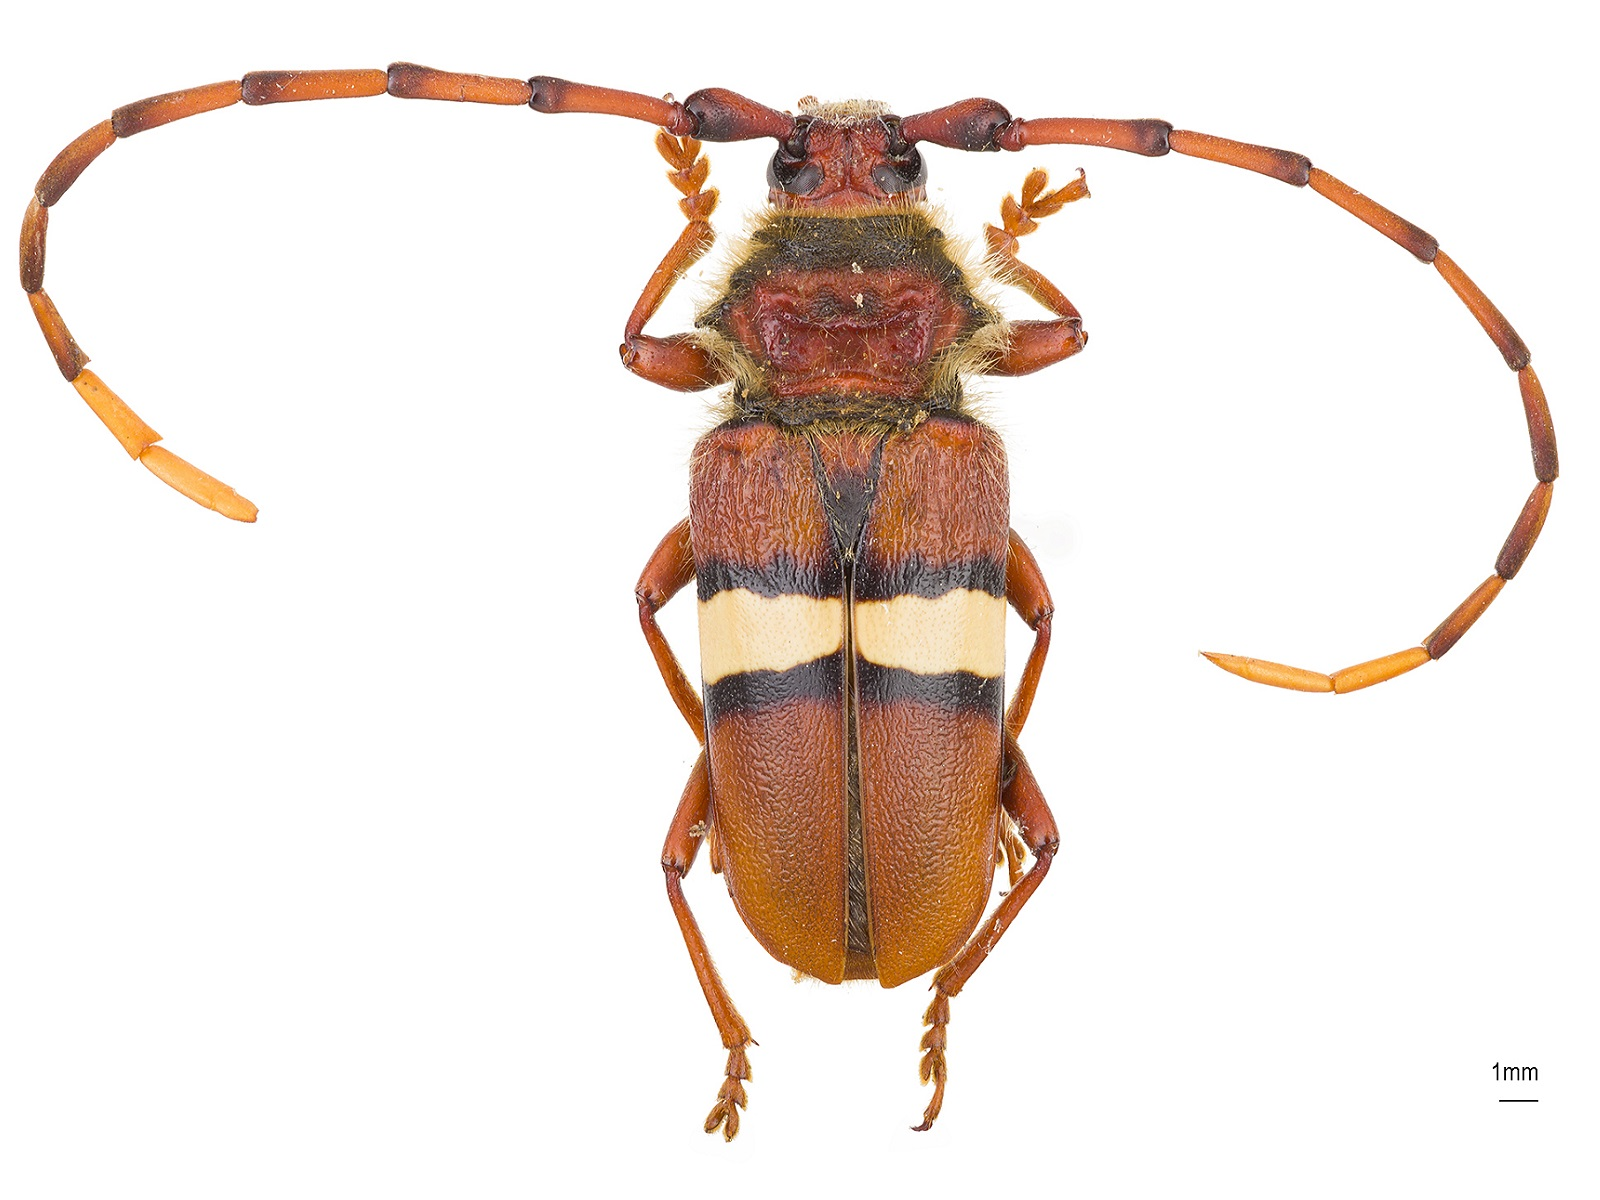 Deretrachys juvencus(Dupont, 1840)